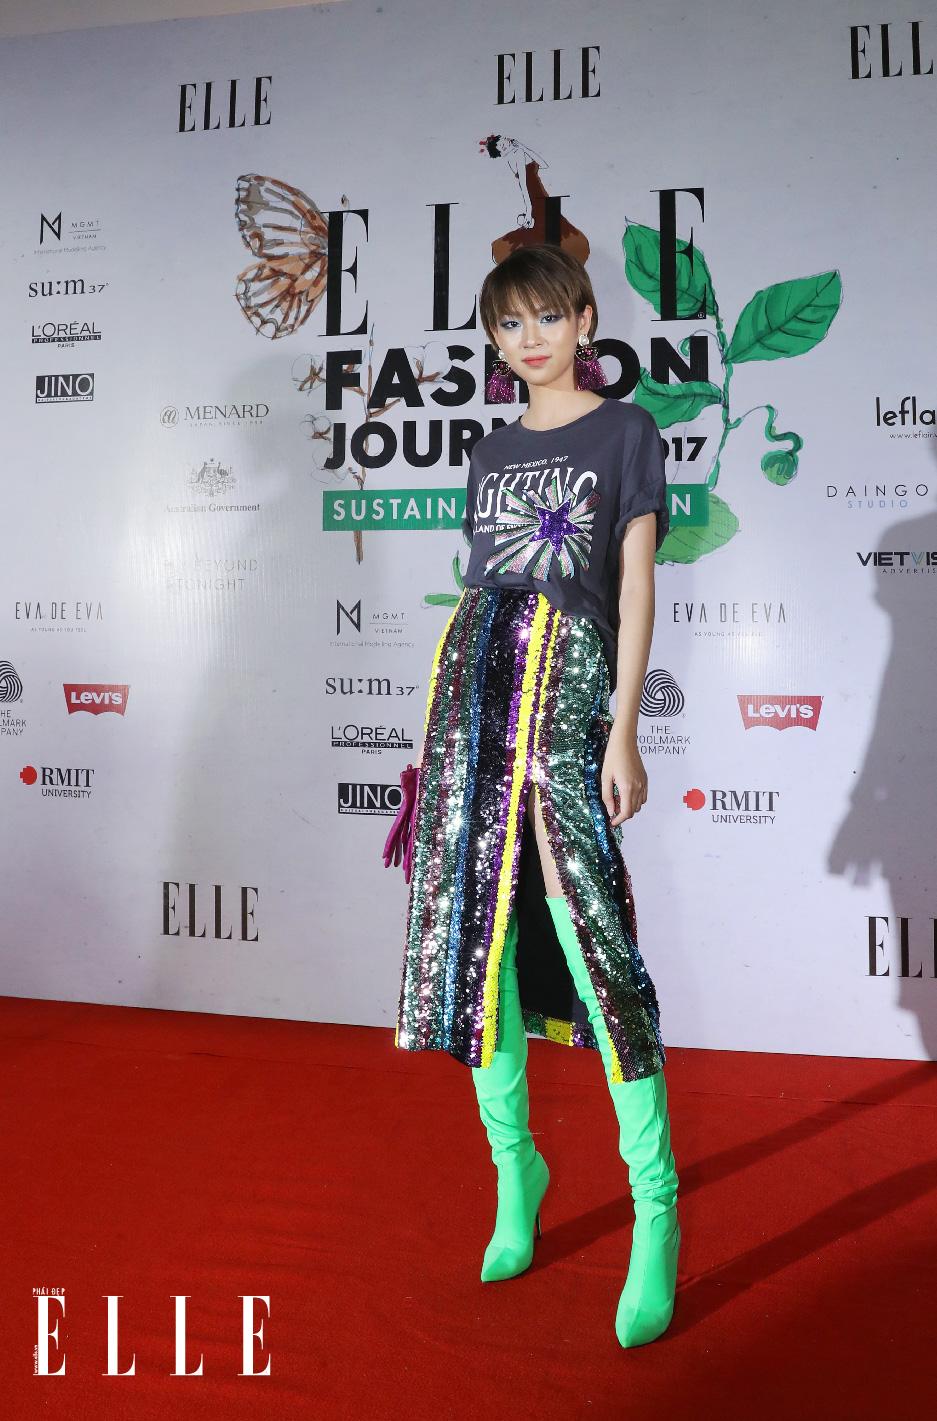 elle fashion journey 2017 13